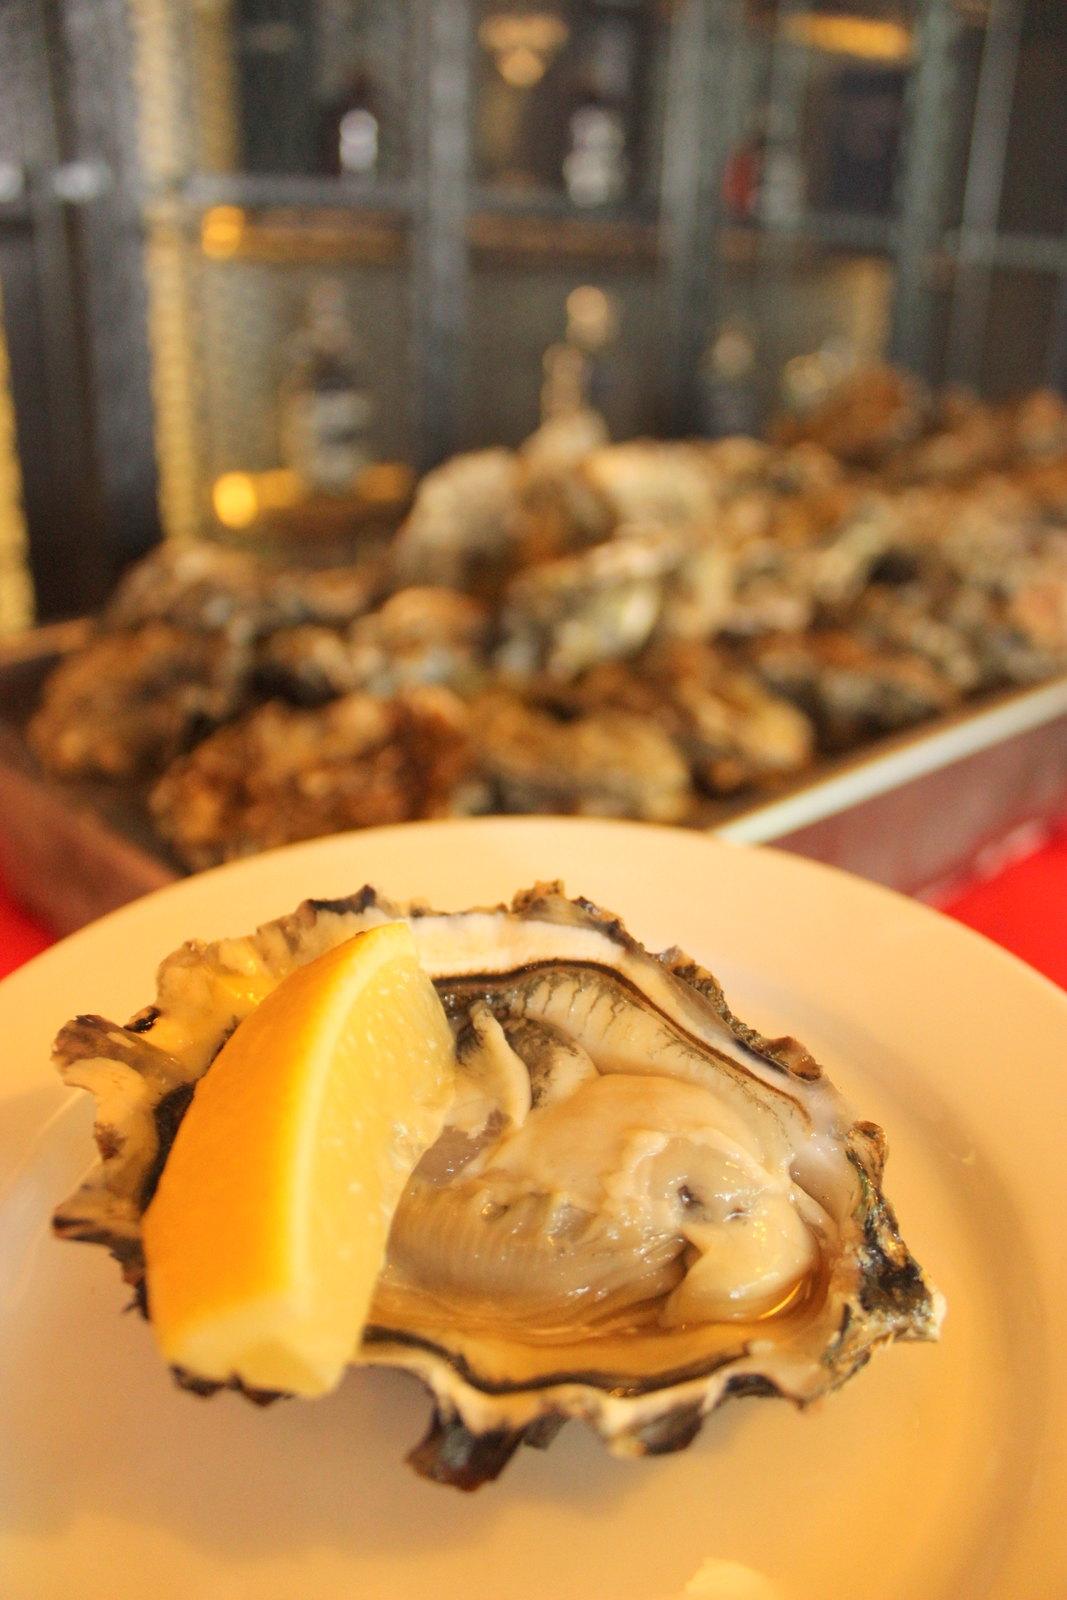 oyster bar KL